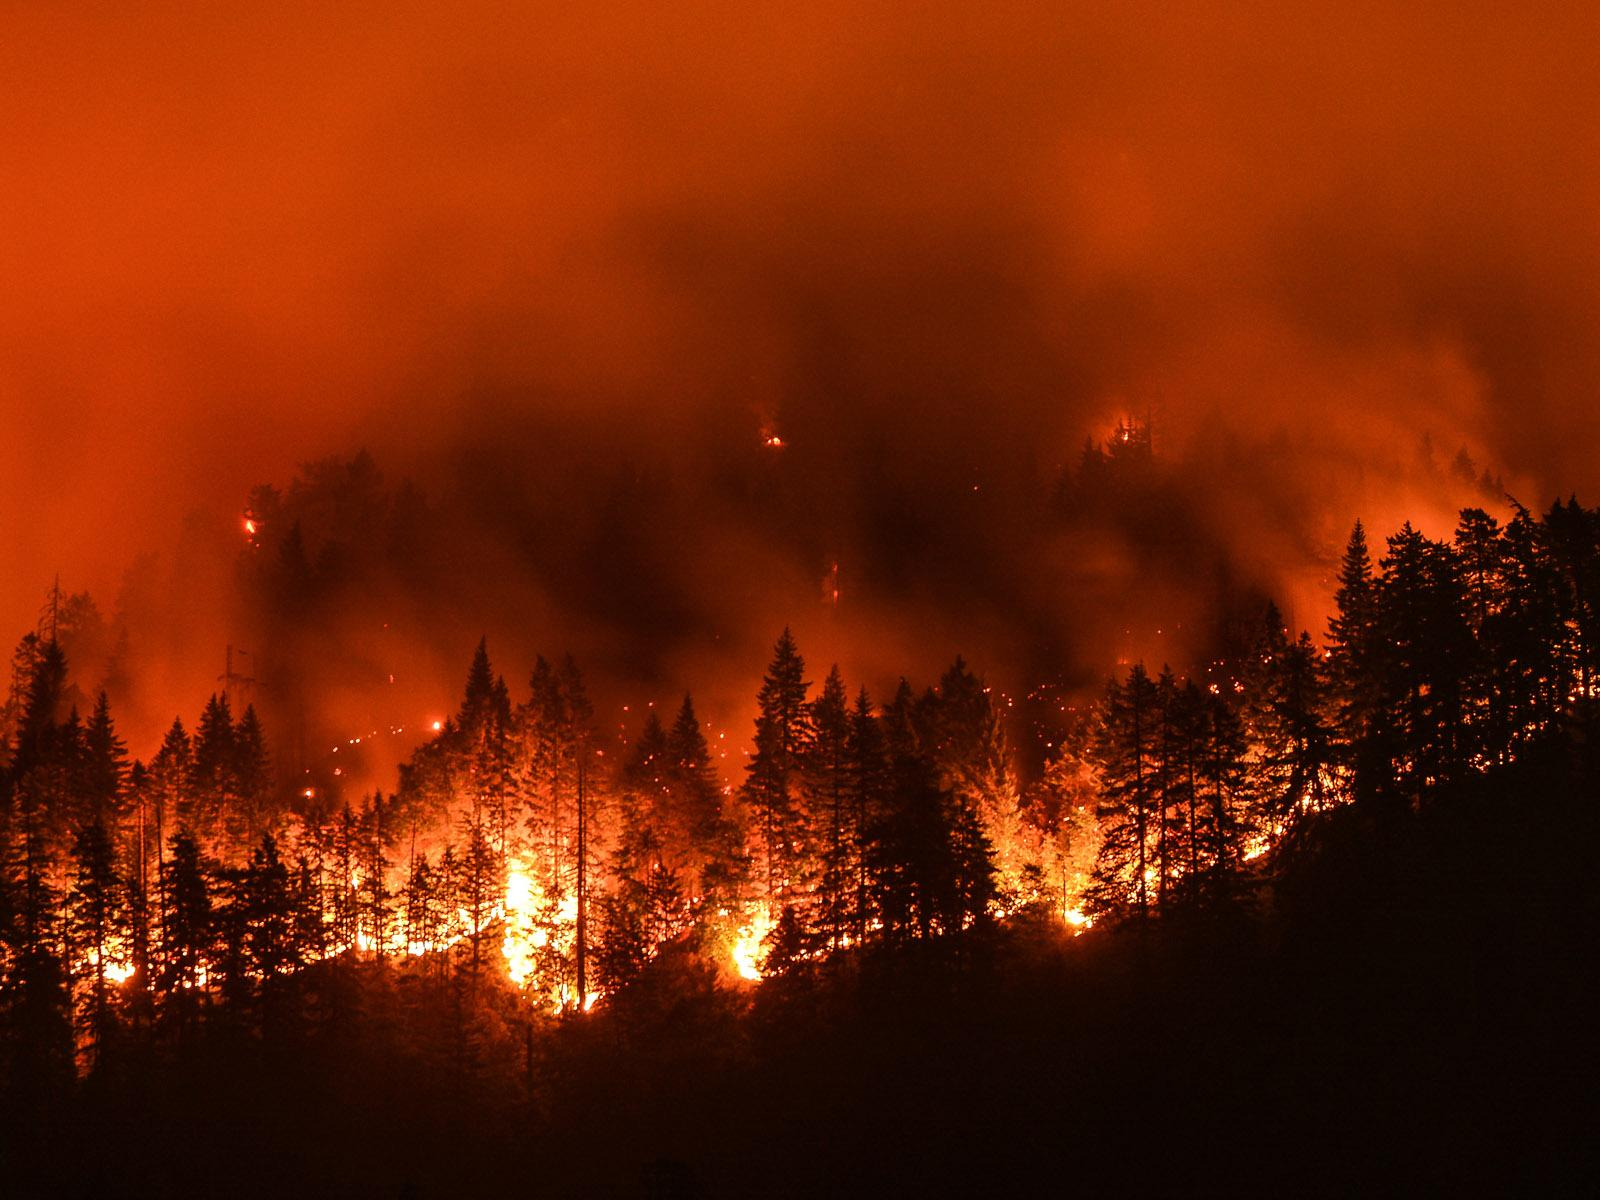 Newswise: PNNL.Wildfire1.1600x1200.jpg?itok=Naf1C9ud